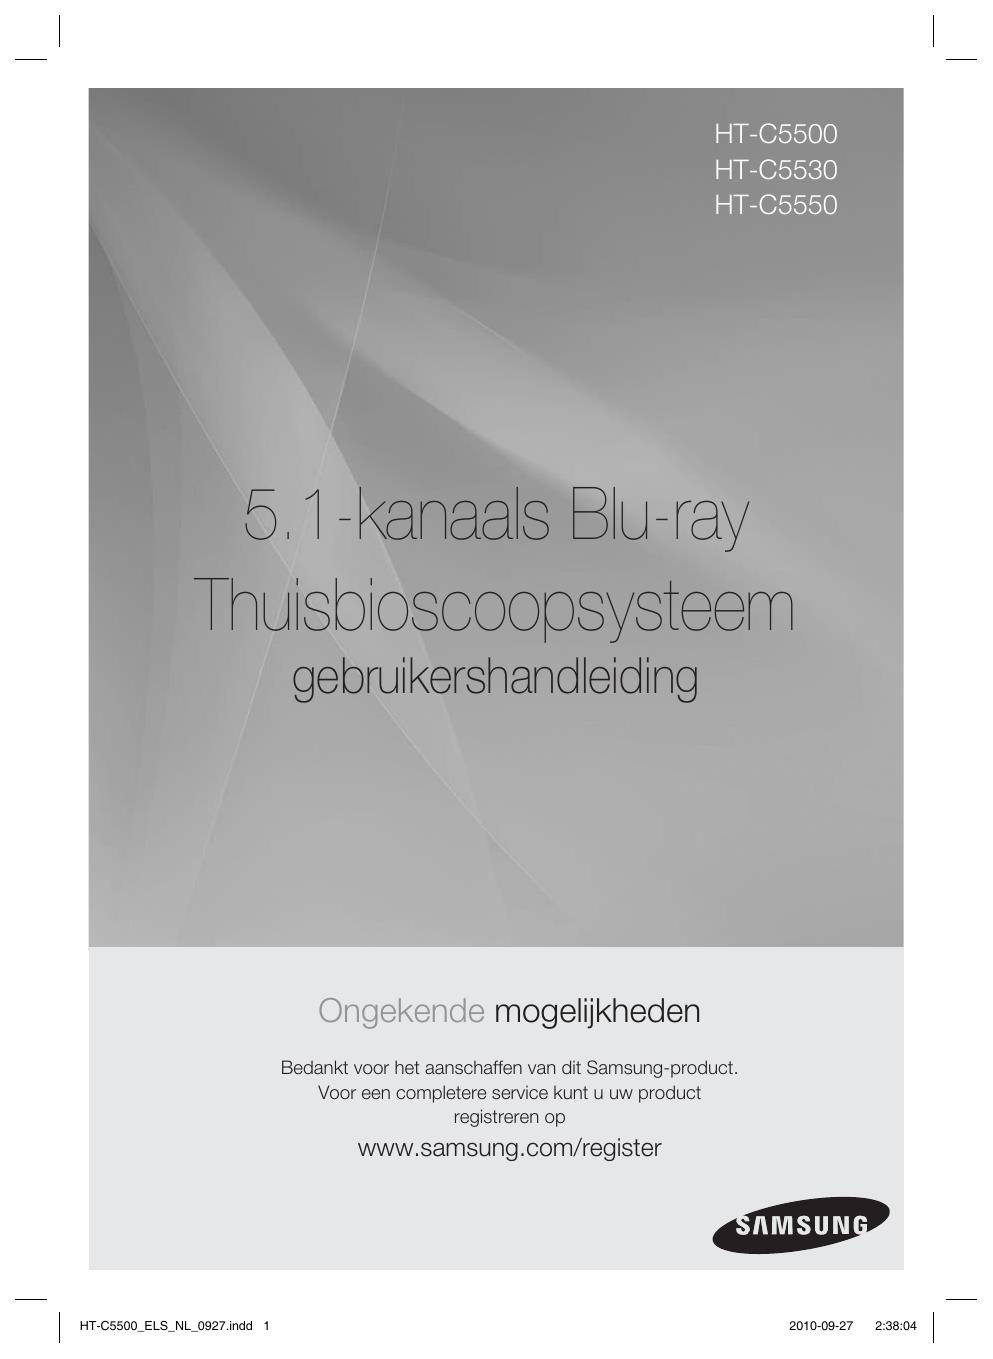 Samsung HT-C5530 Handleiding